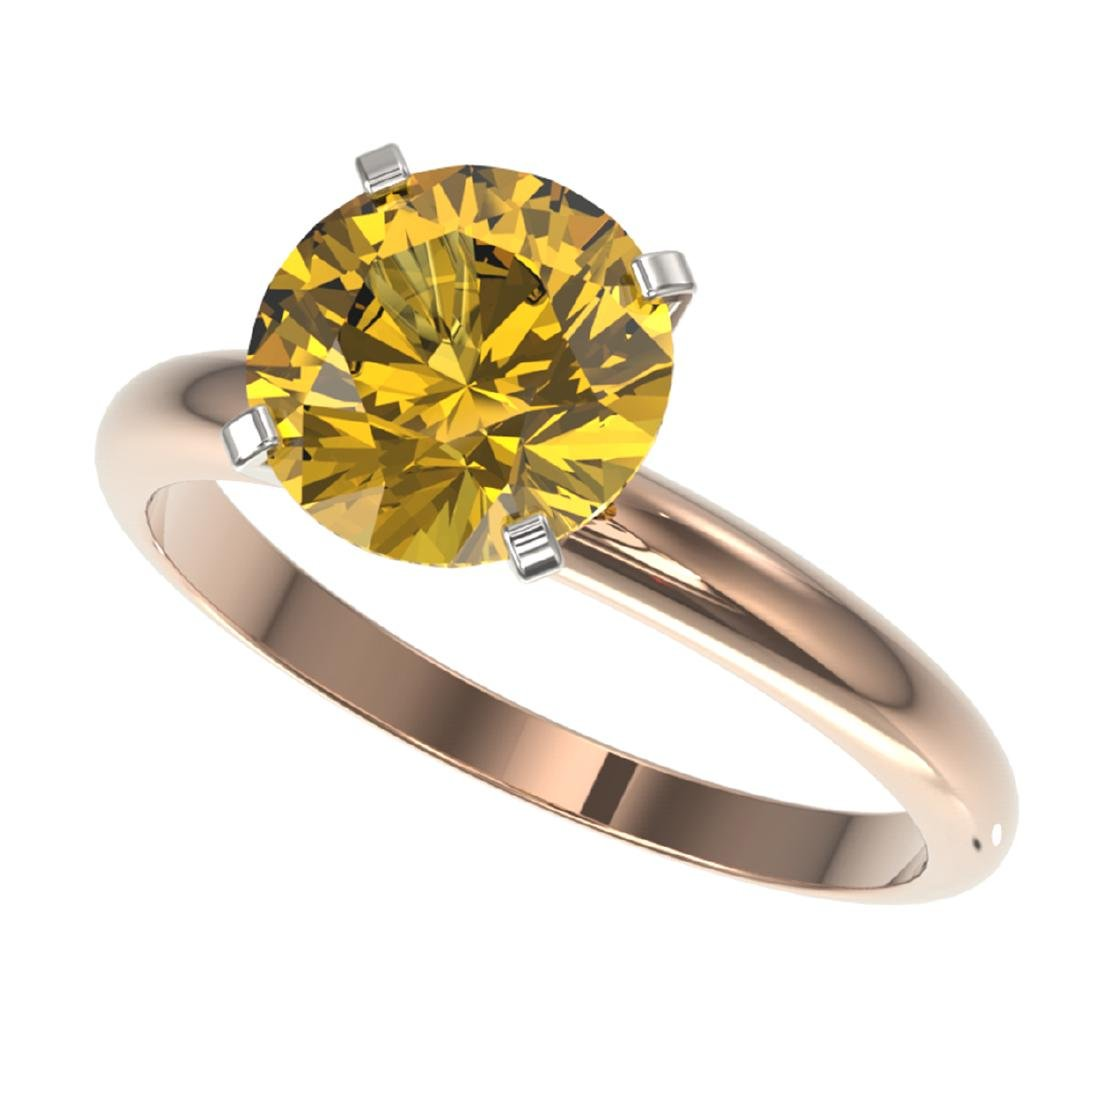 2.50 ctw Intense Yellow SI Diamond Solitaire Ring 10K